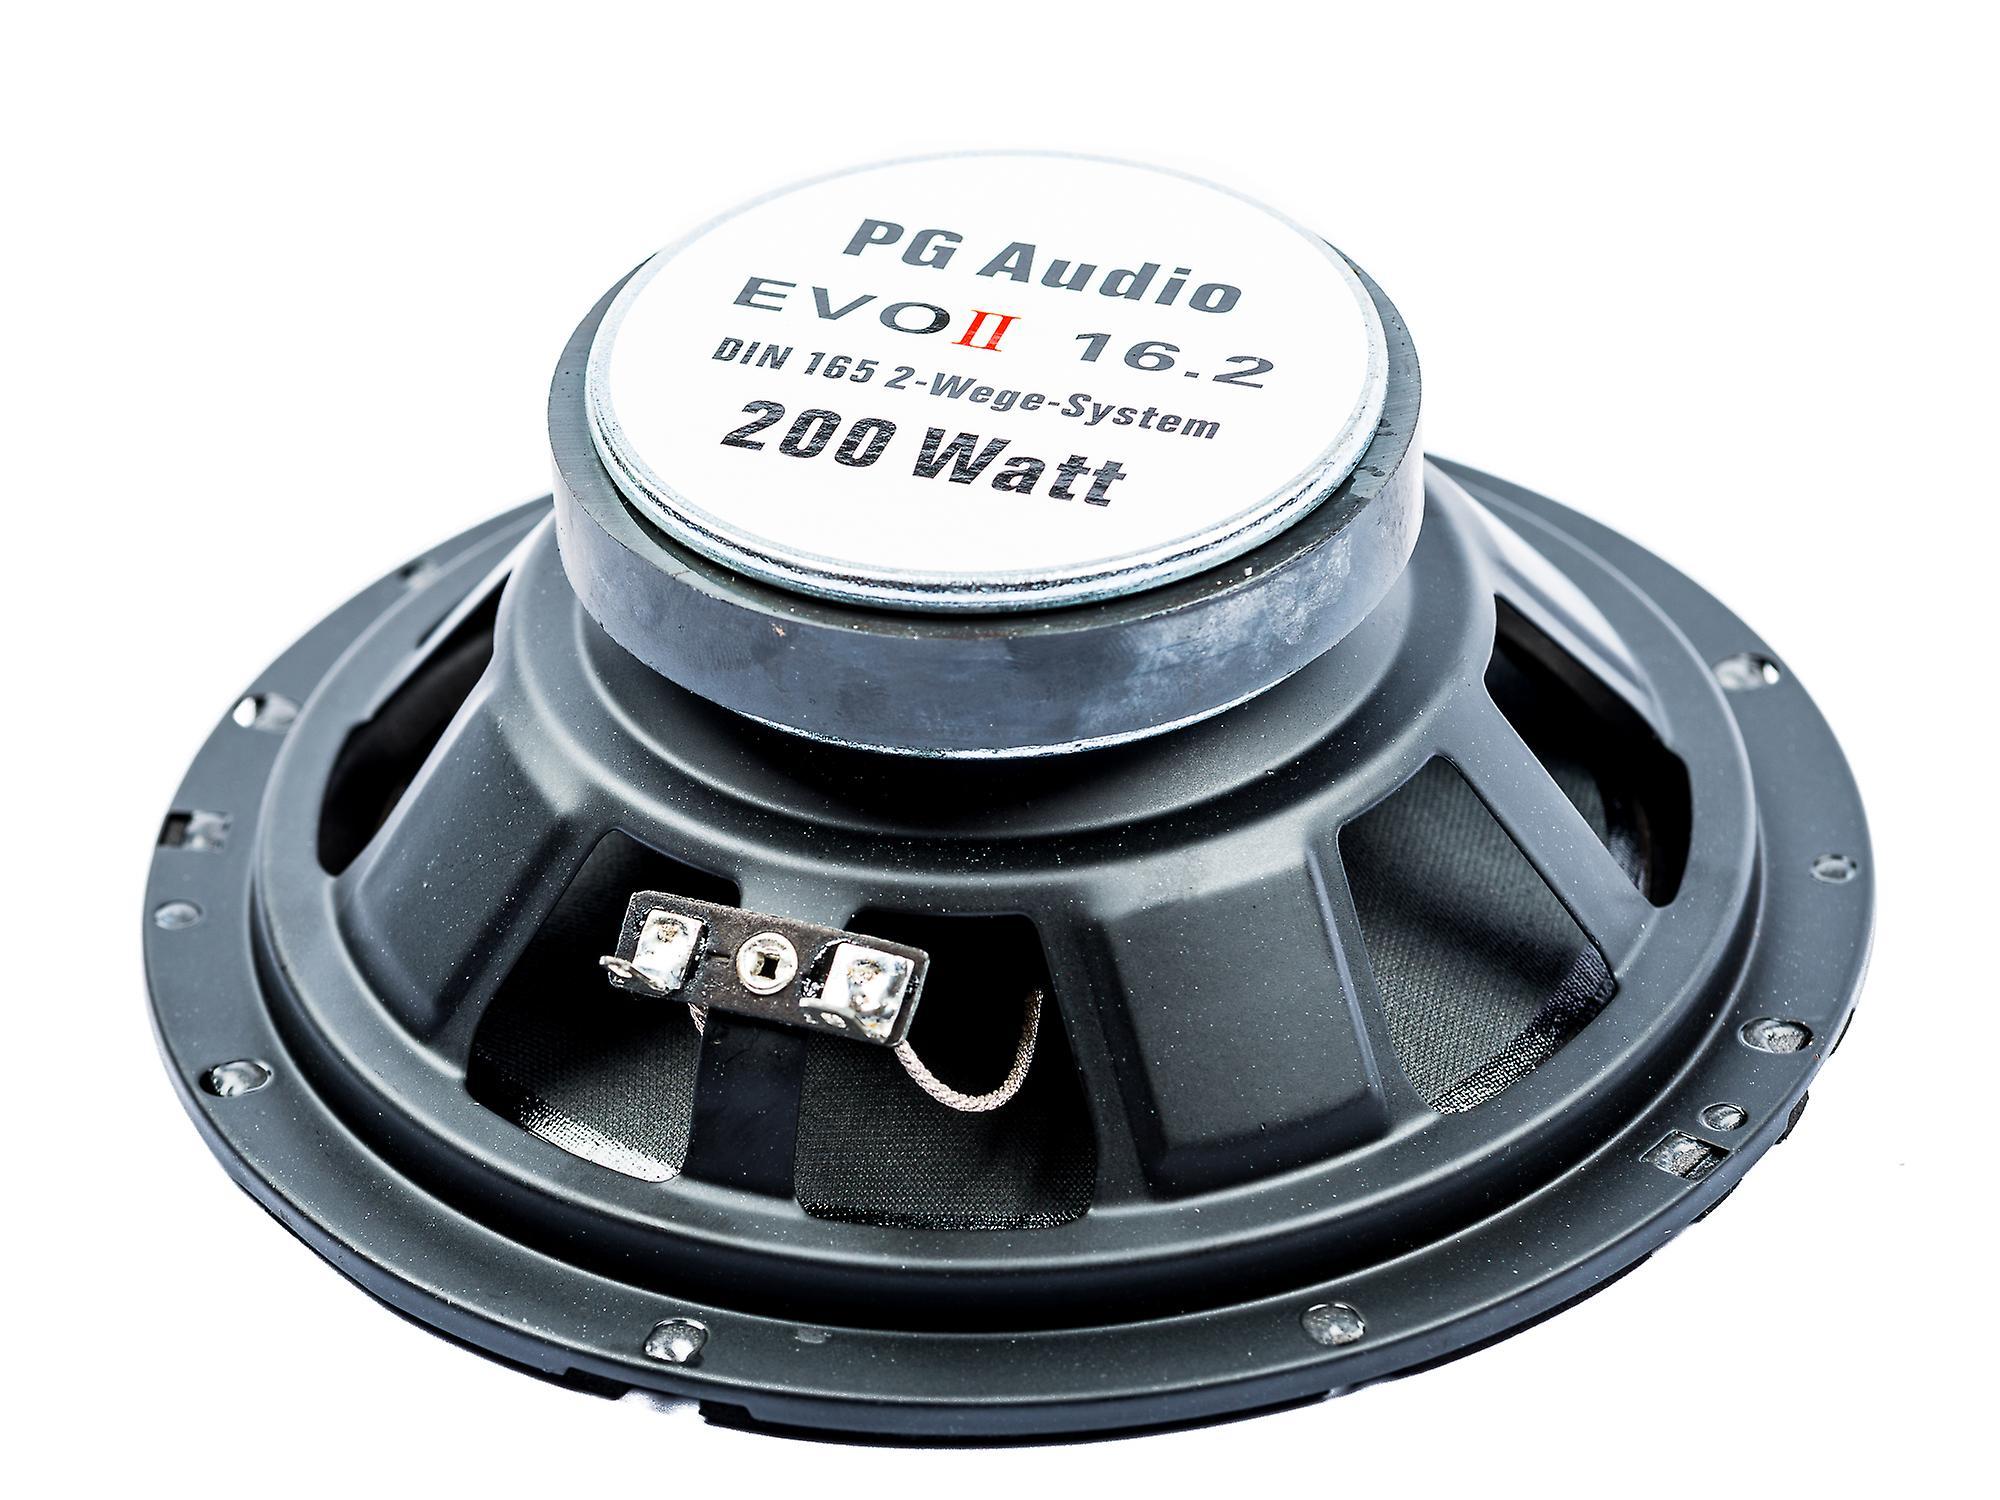 EA ABS Ring Sensorring Mitsubishi Galant Vl Station Wagon Vorderachse NEU